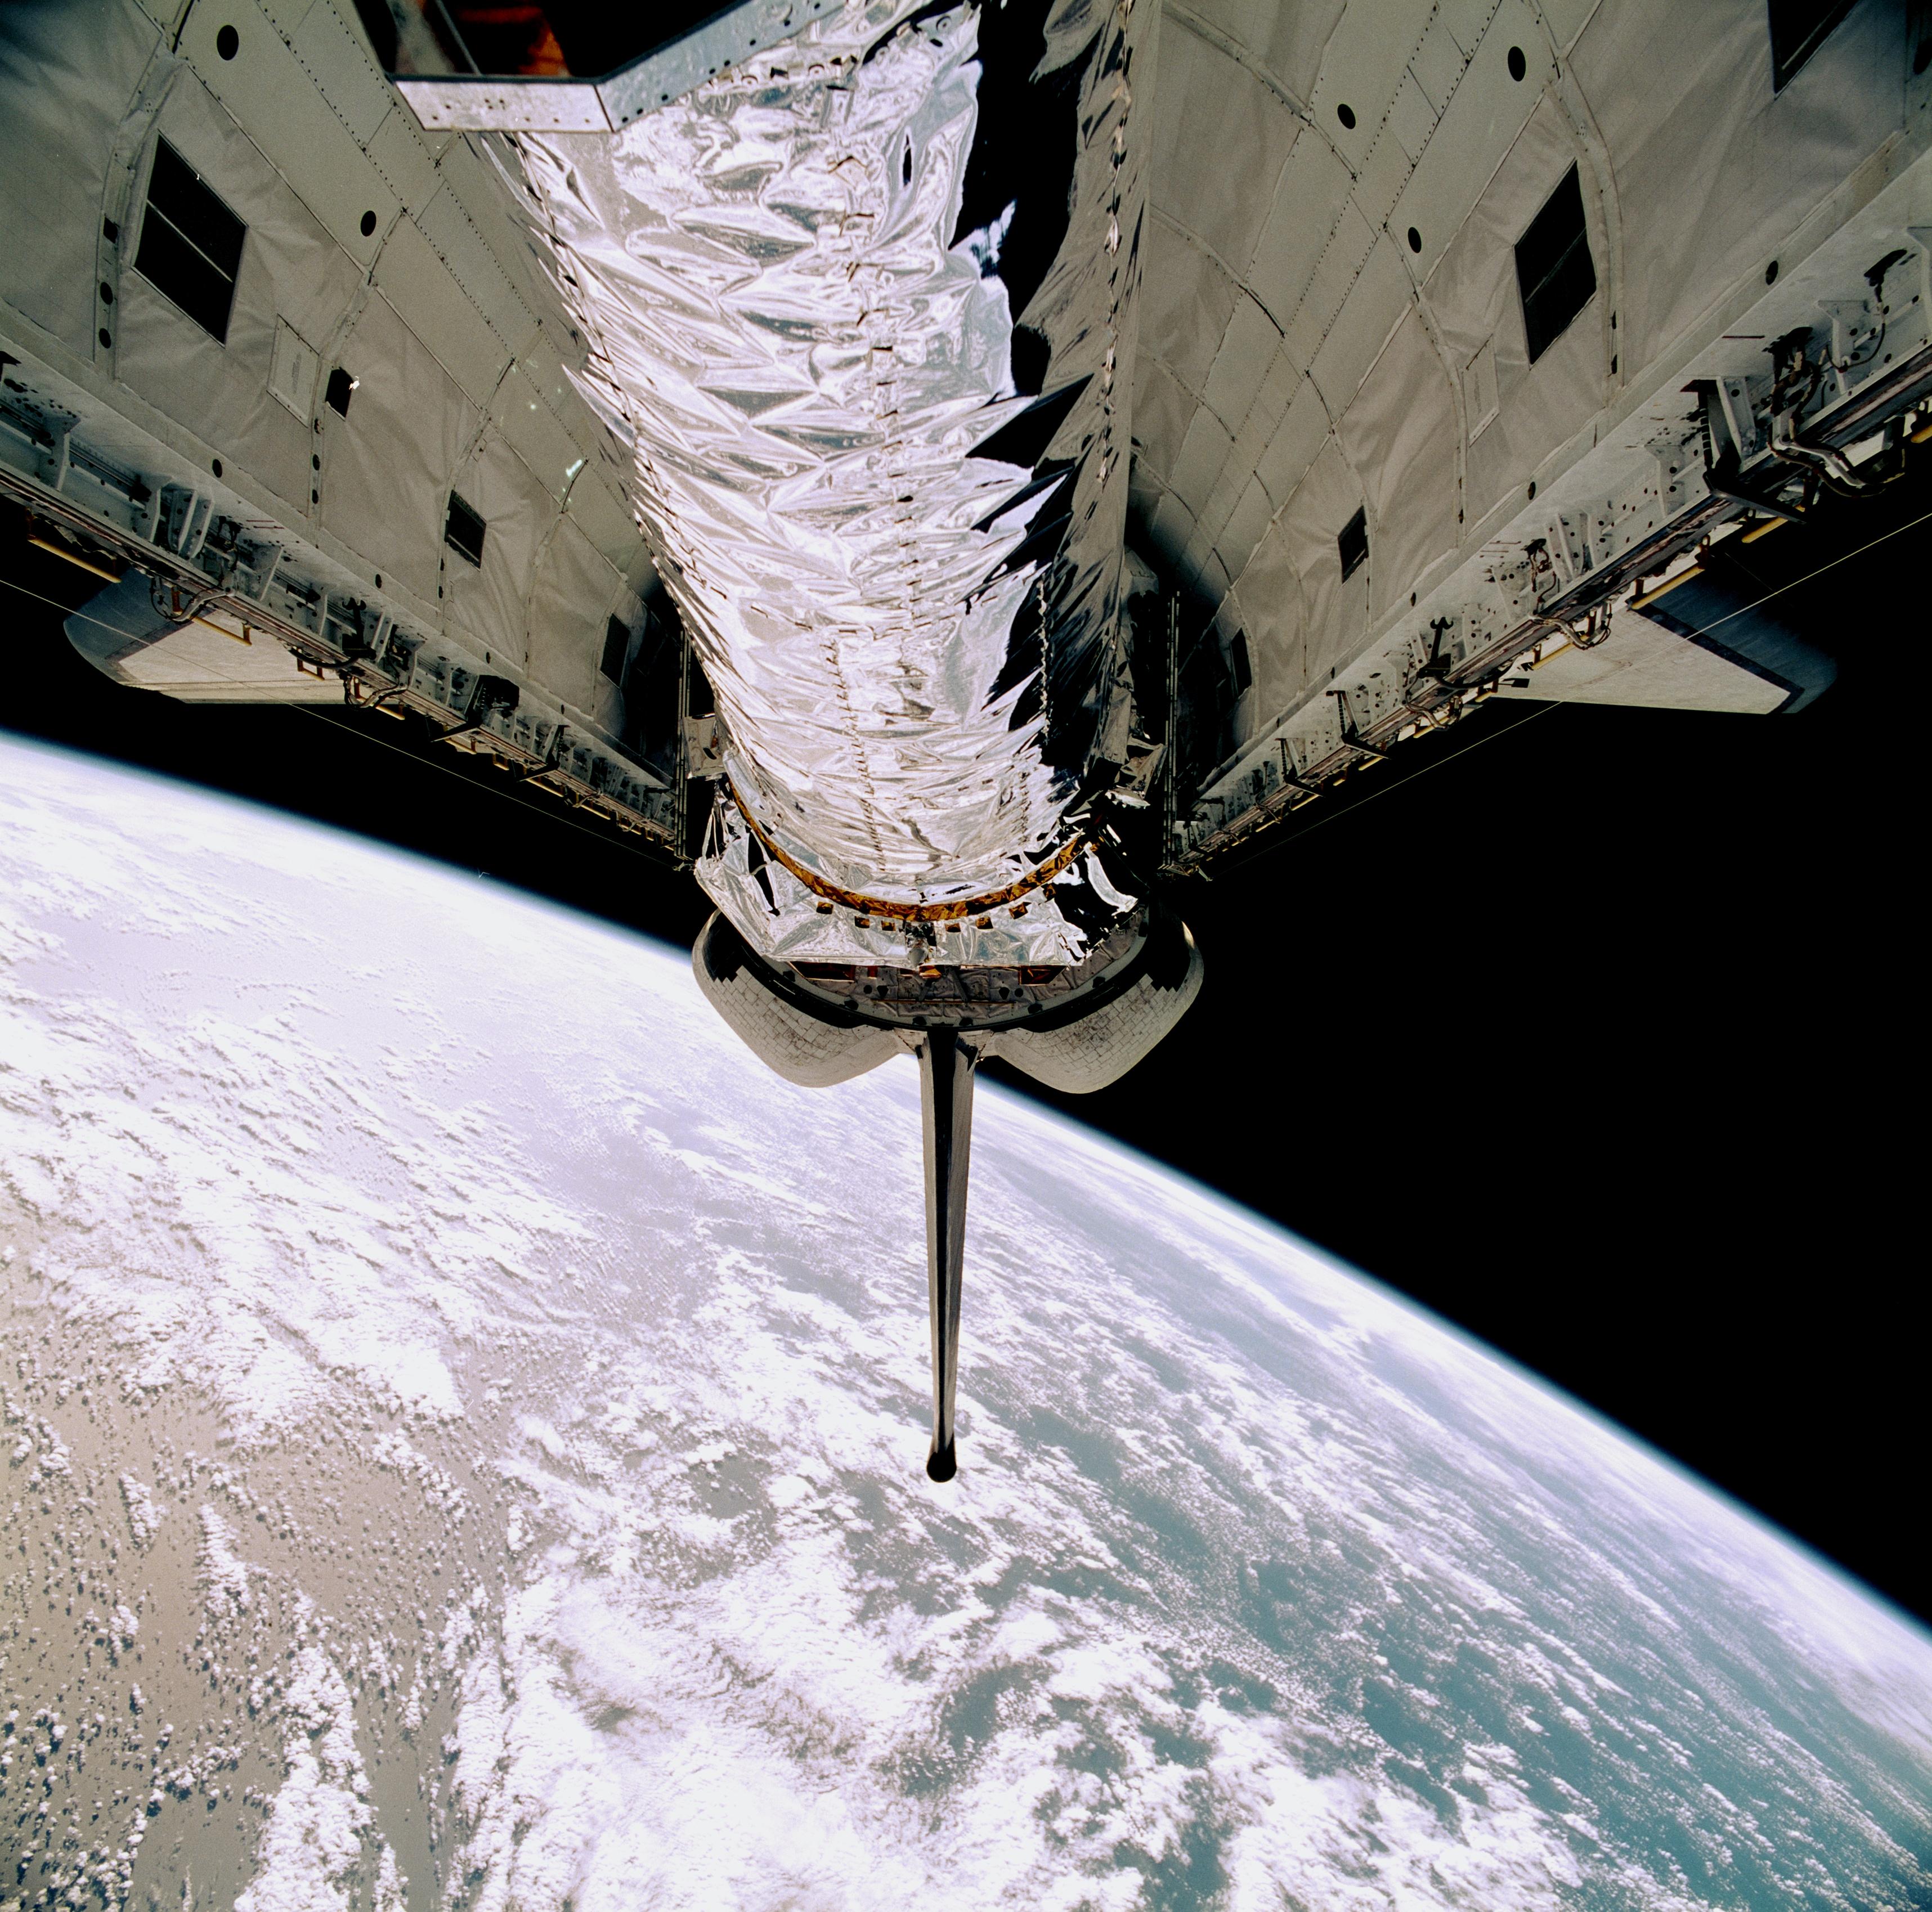 July 23, 1999, Chandra X-ray Observatory Awaits Deployment ...